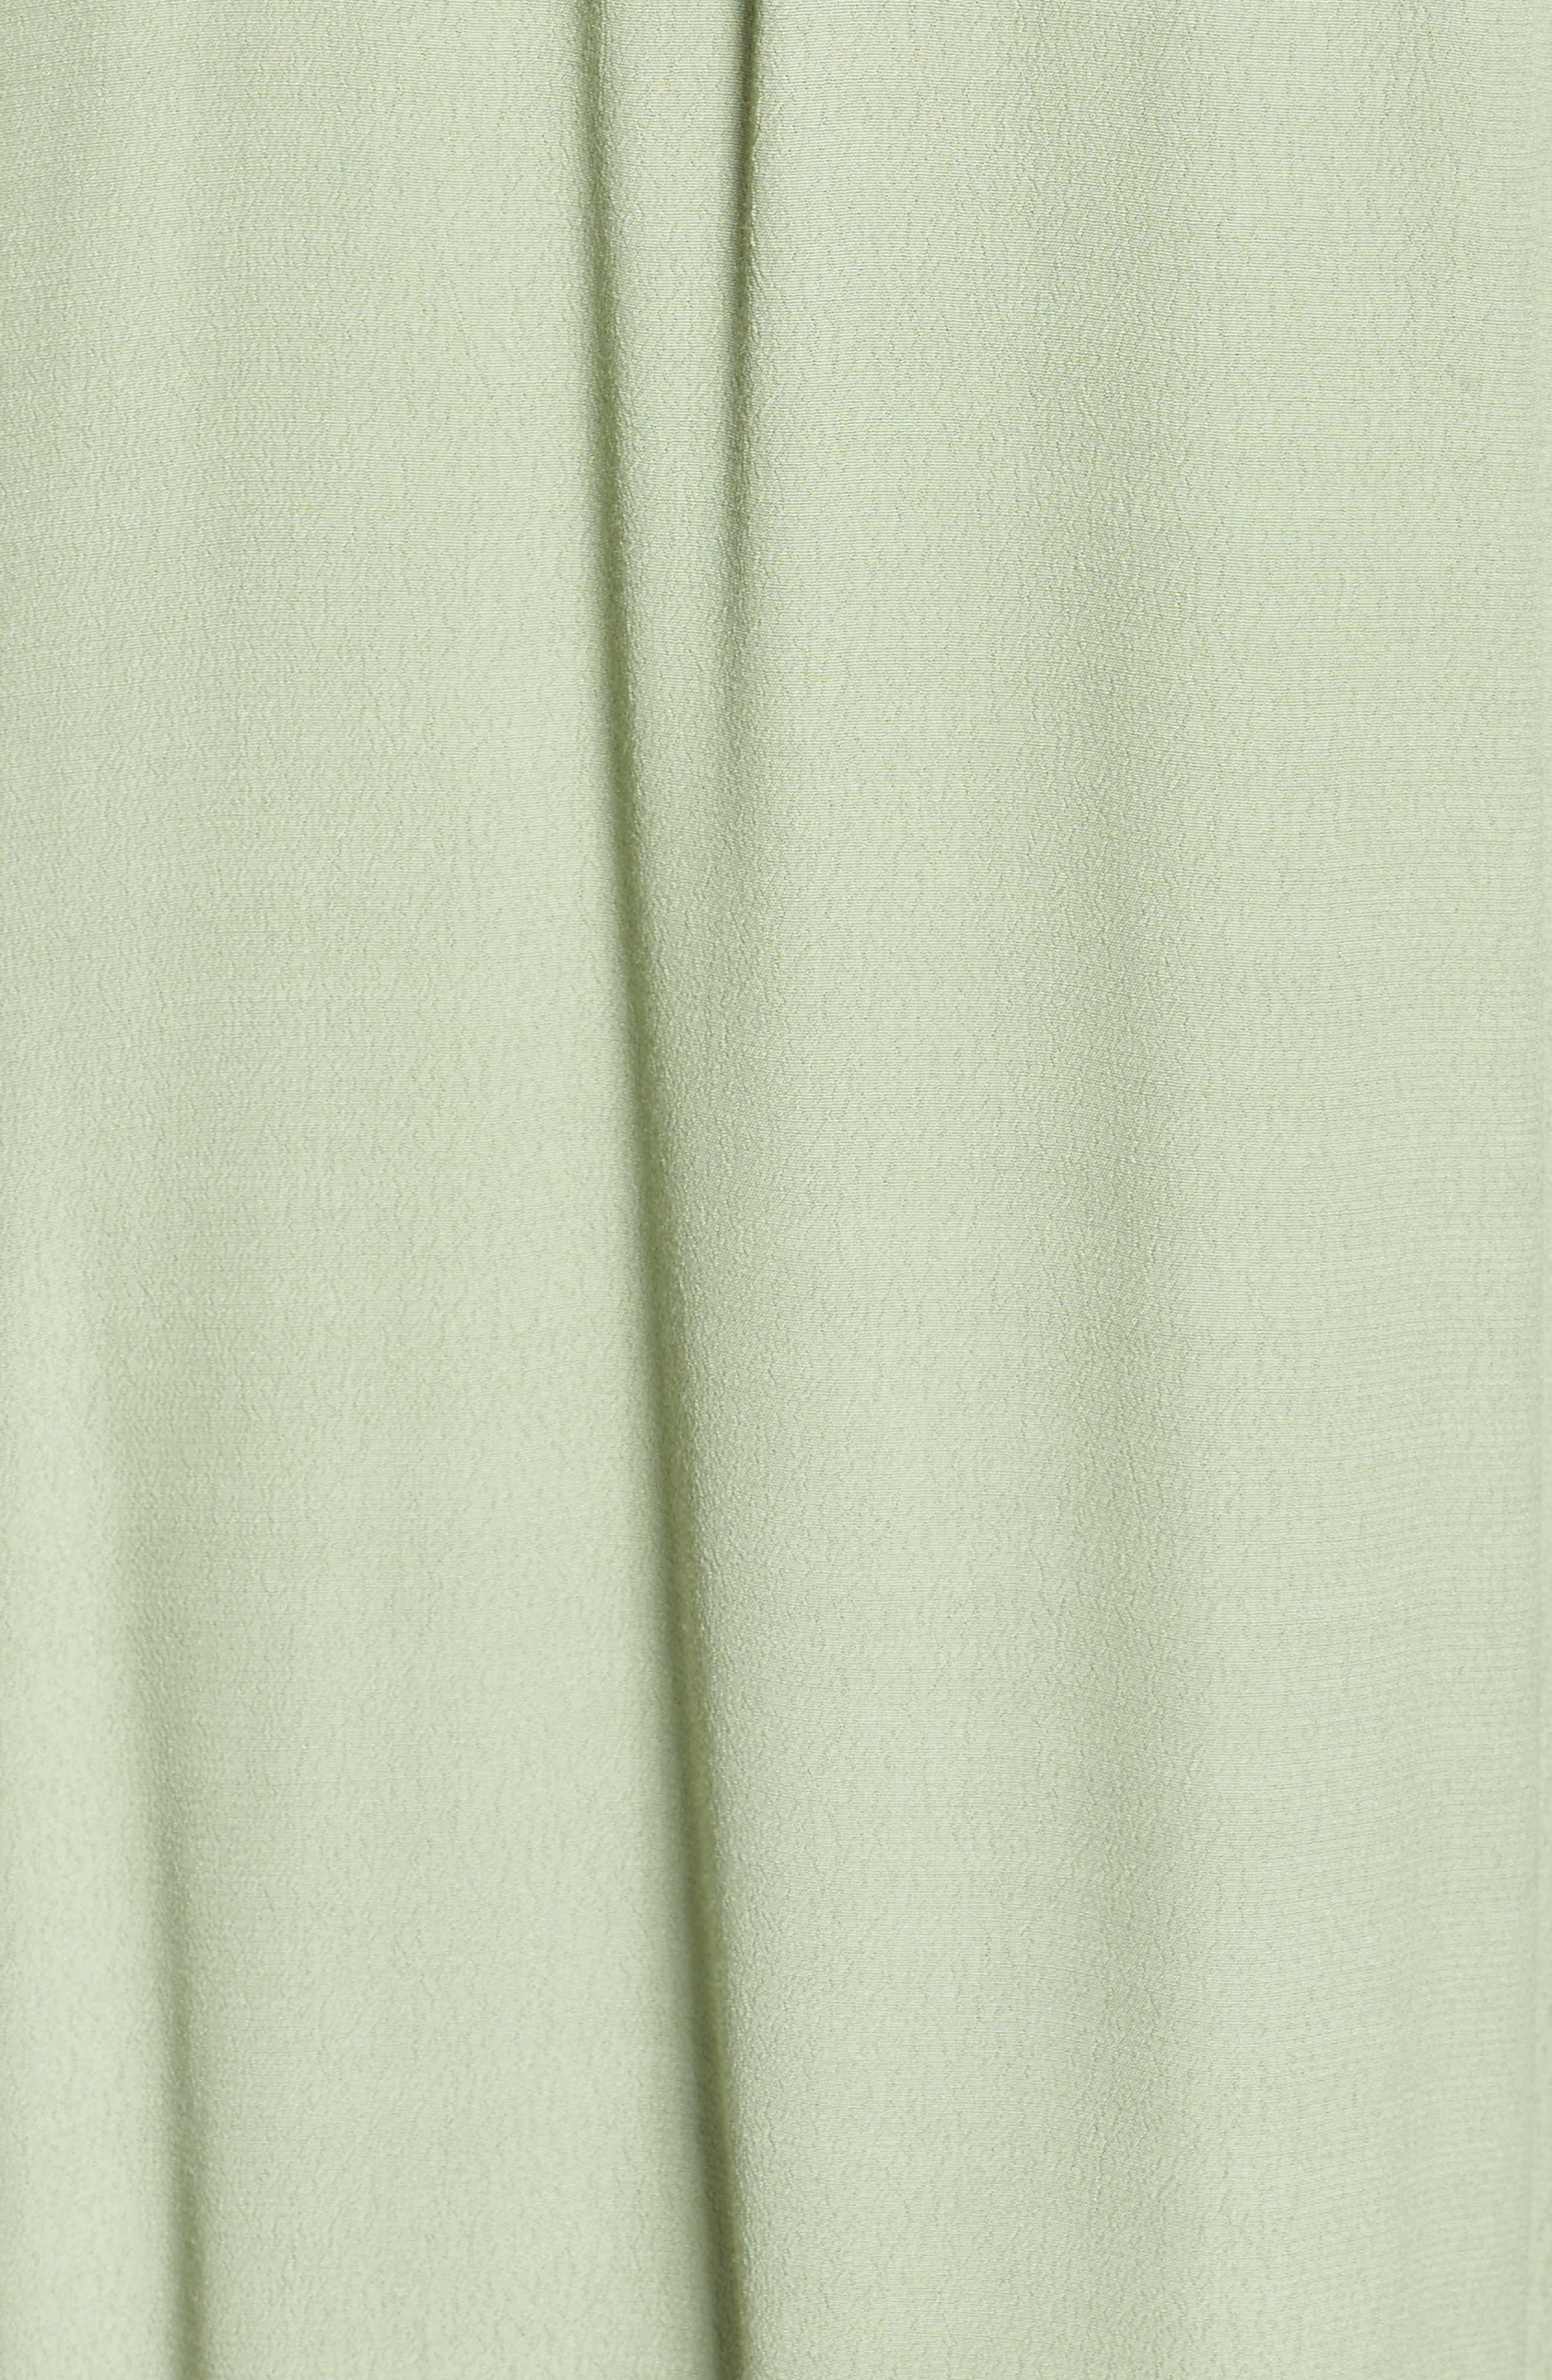 Roe + May Jolie Crepe Peplum Dress,                             Alternate thumbnail 9, color,